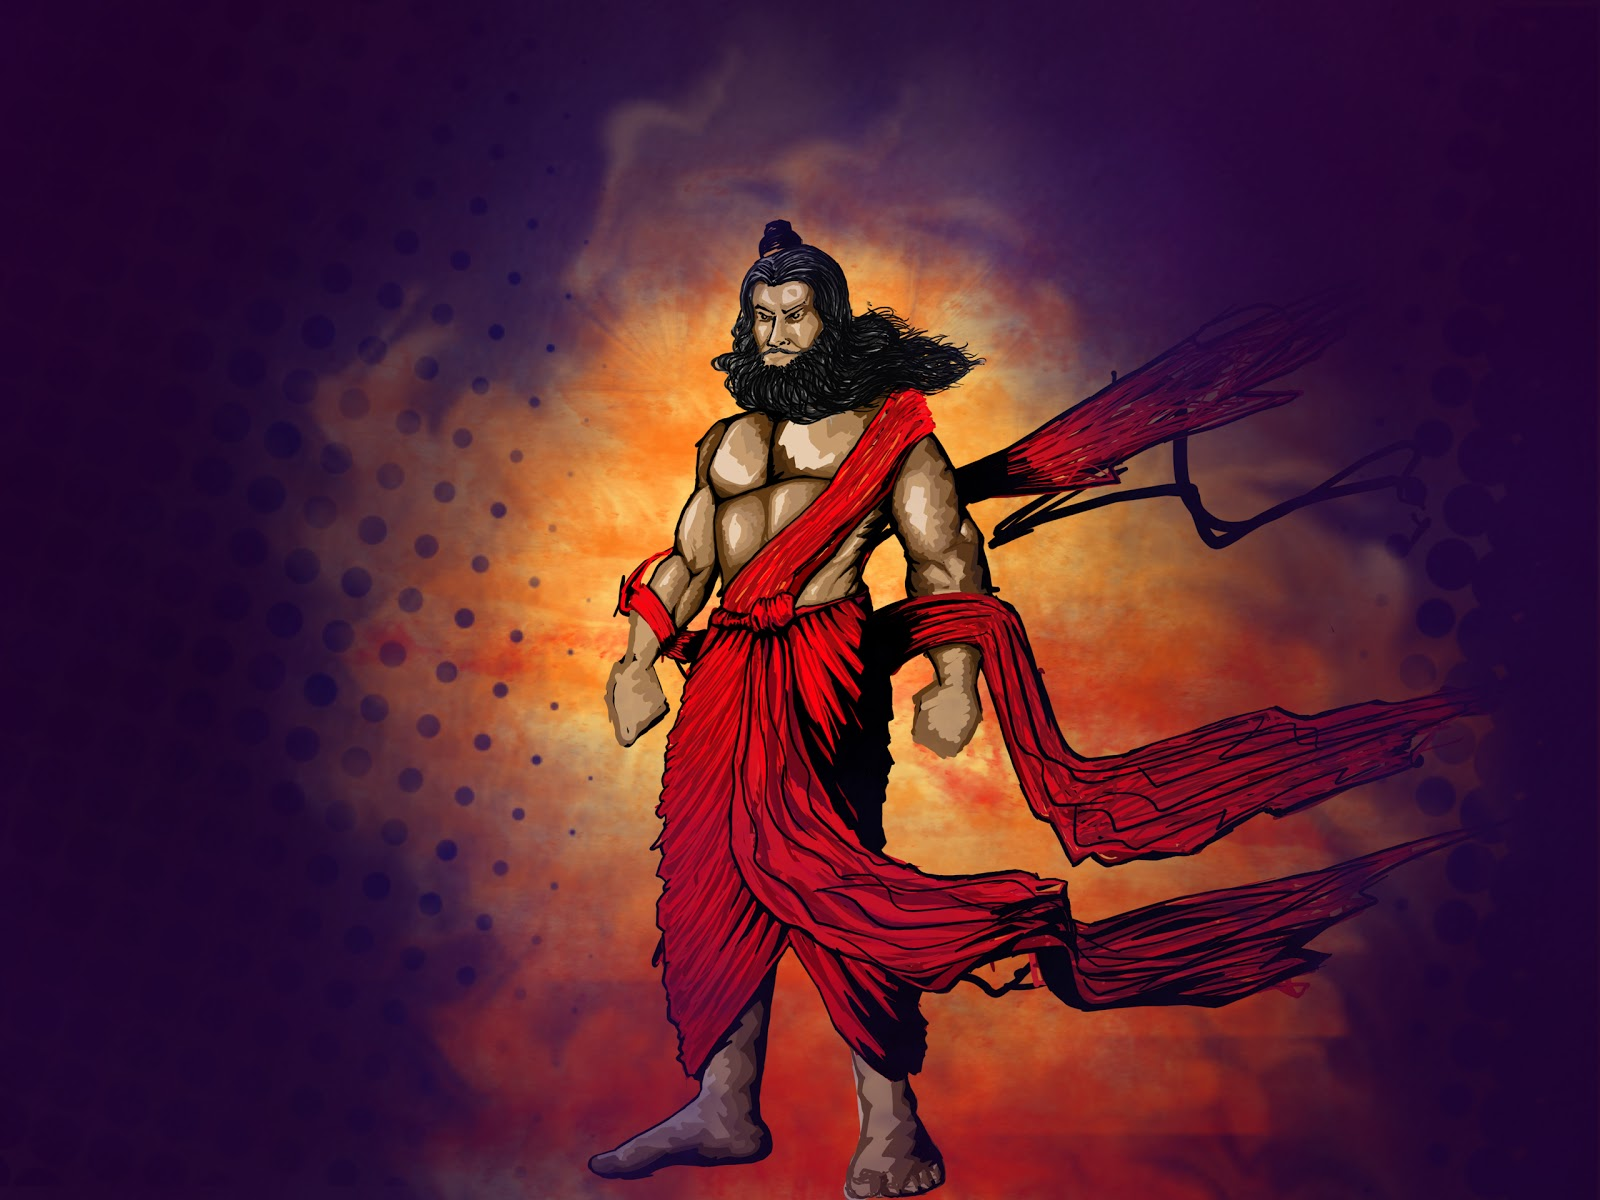 bhagwan parshuram hd images